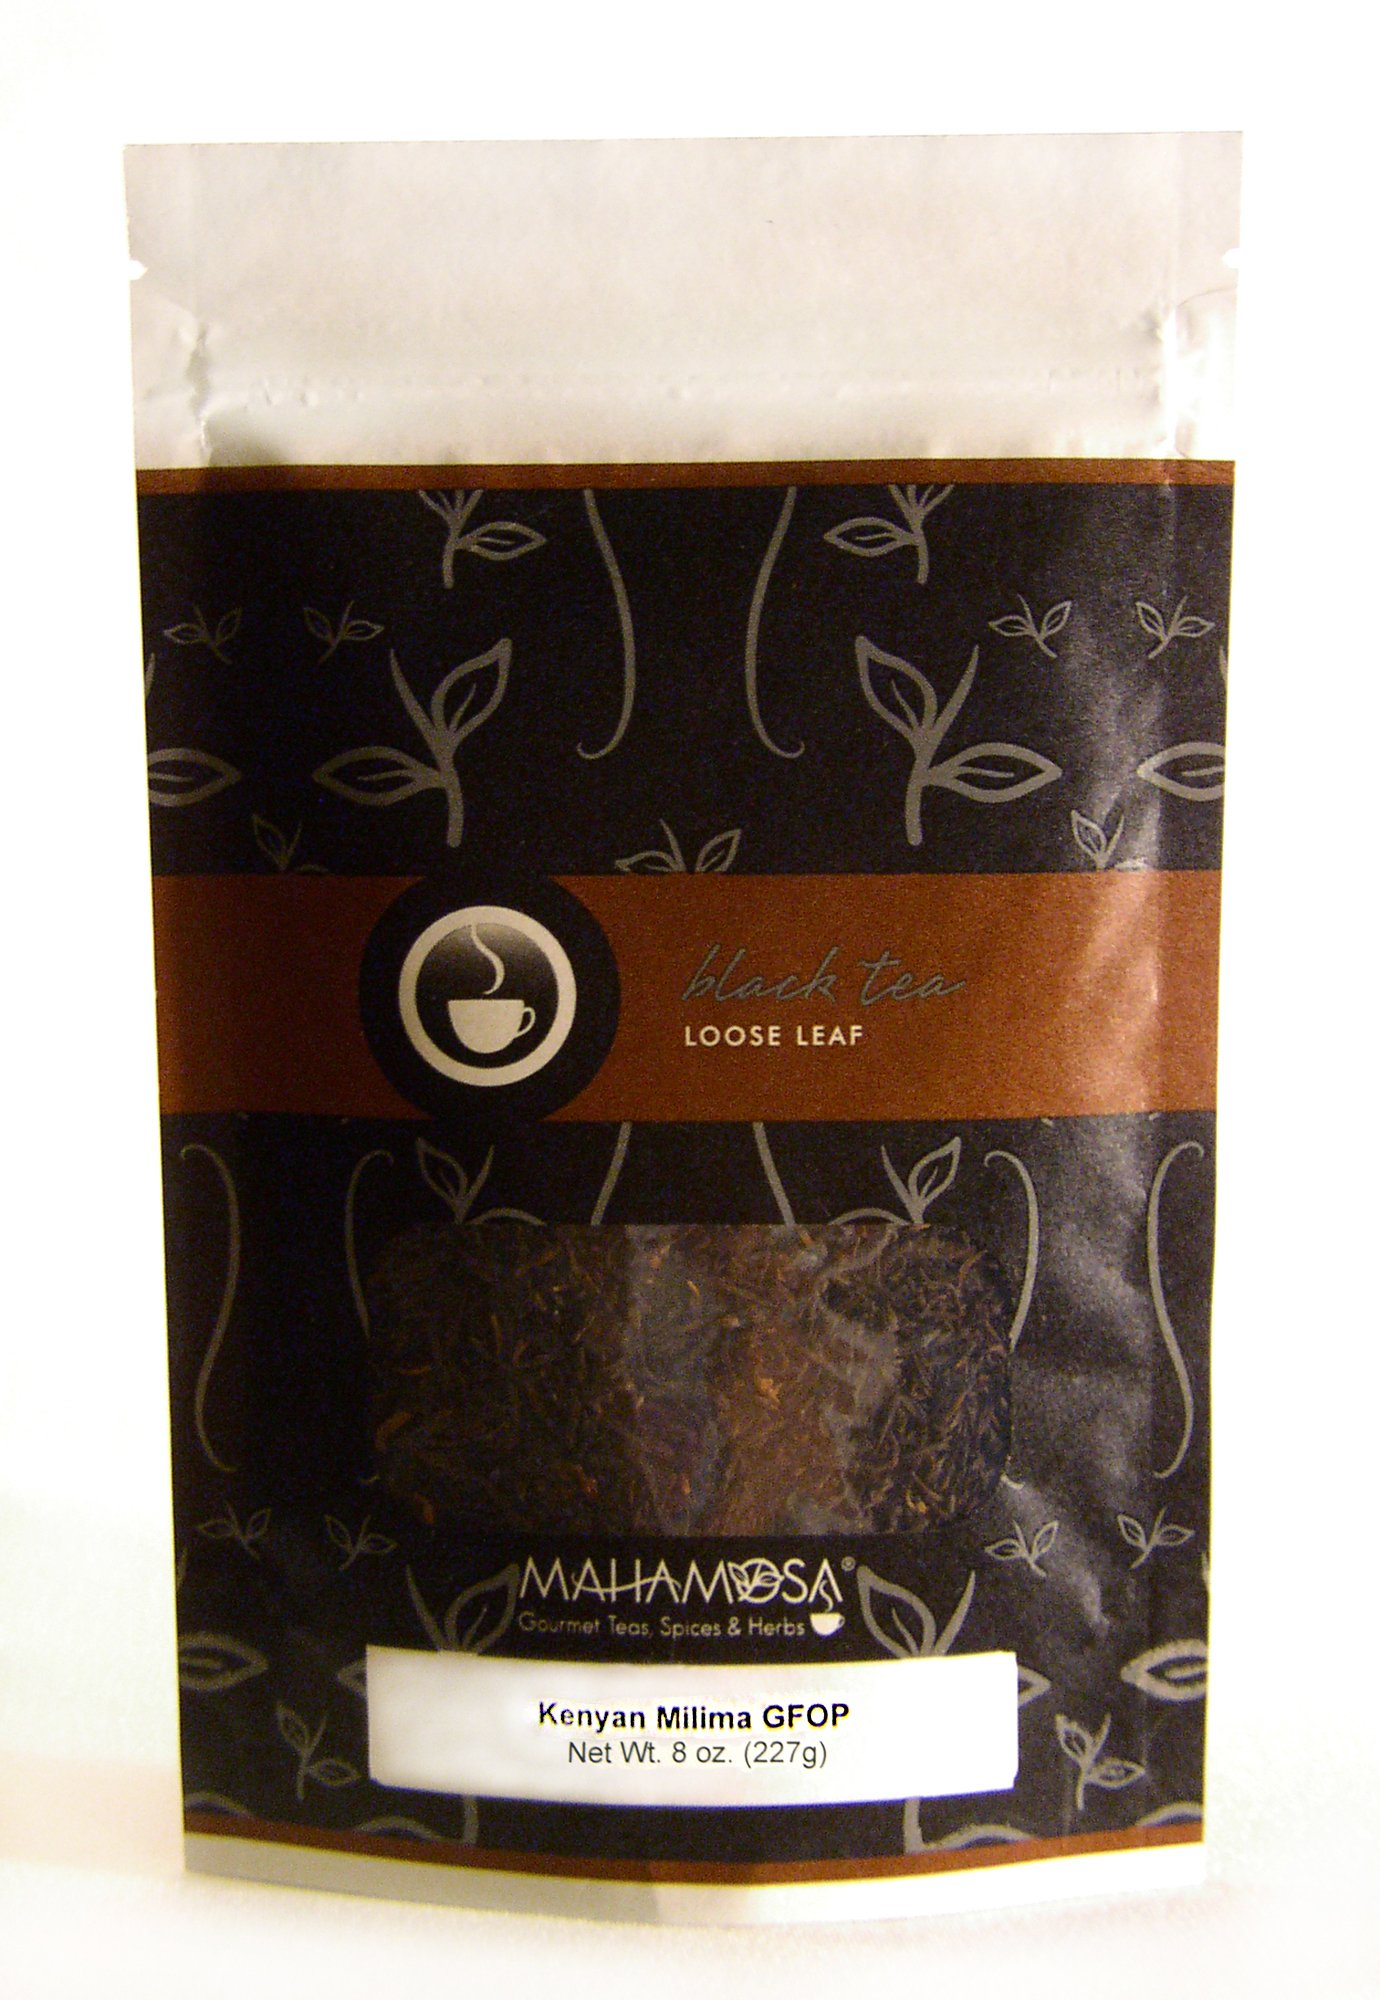 Mahamosa African Black Tea and Tea Infuser Set: 8 oz Kenyan Milima GFOP Black Tea, 1 Stainless Steel Tea Ball Infuser (Bundle- 2 items)(Tea Ingredients: Kenyan black tea)